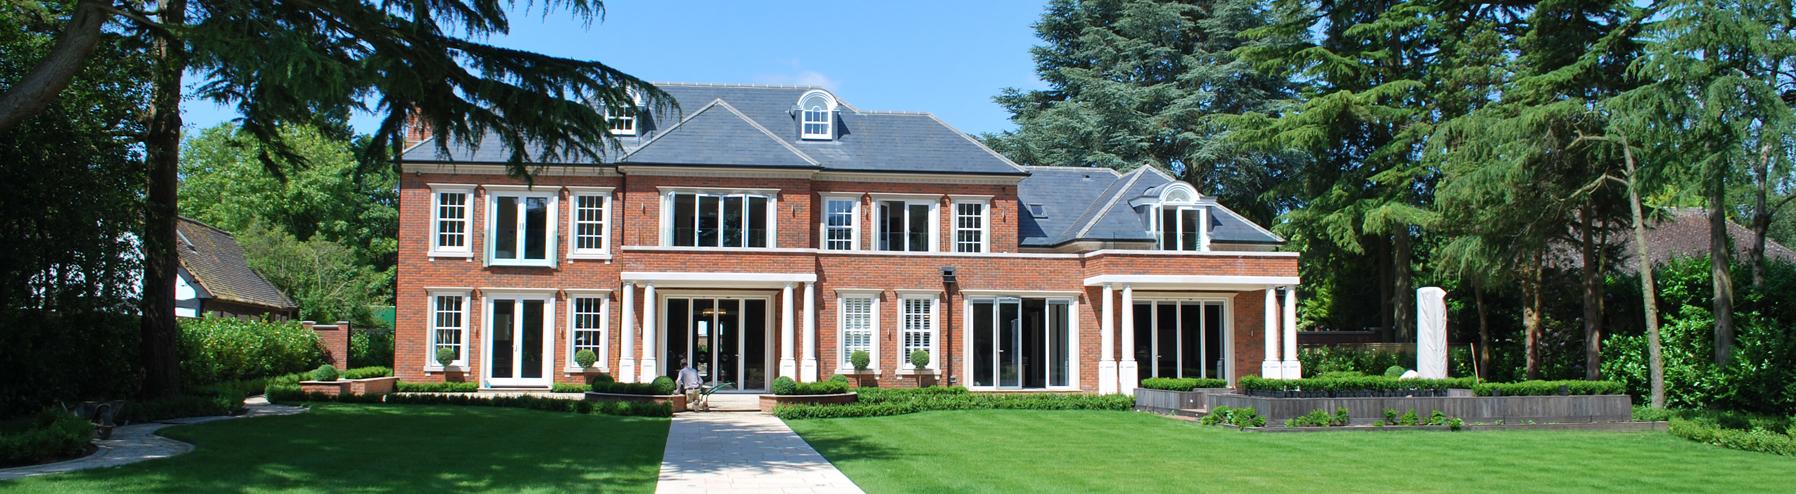 The Grange, Sandy Lane, Kingswood